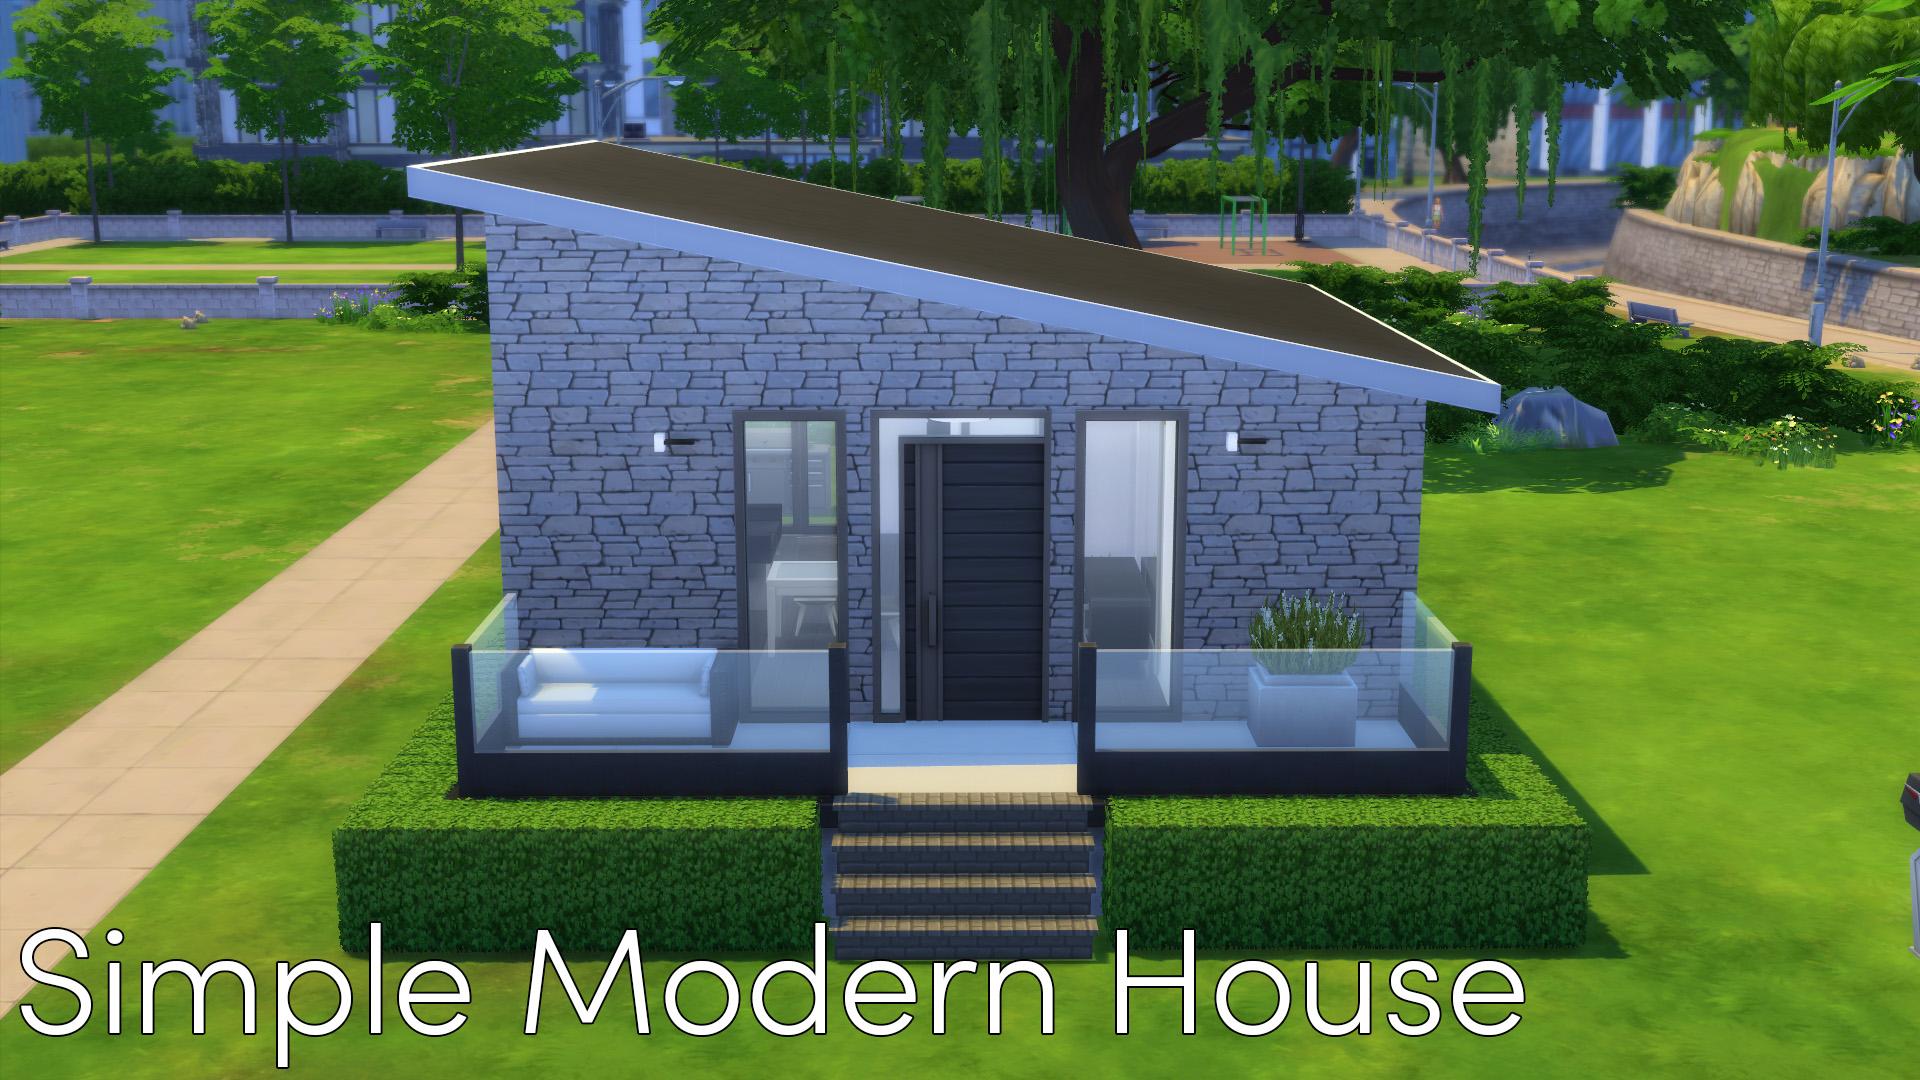 Mod The Sims Member Malwa1216